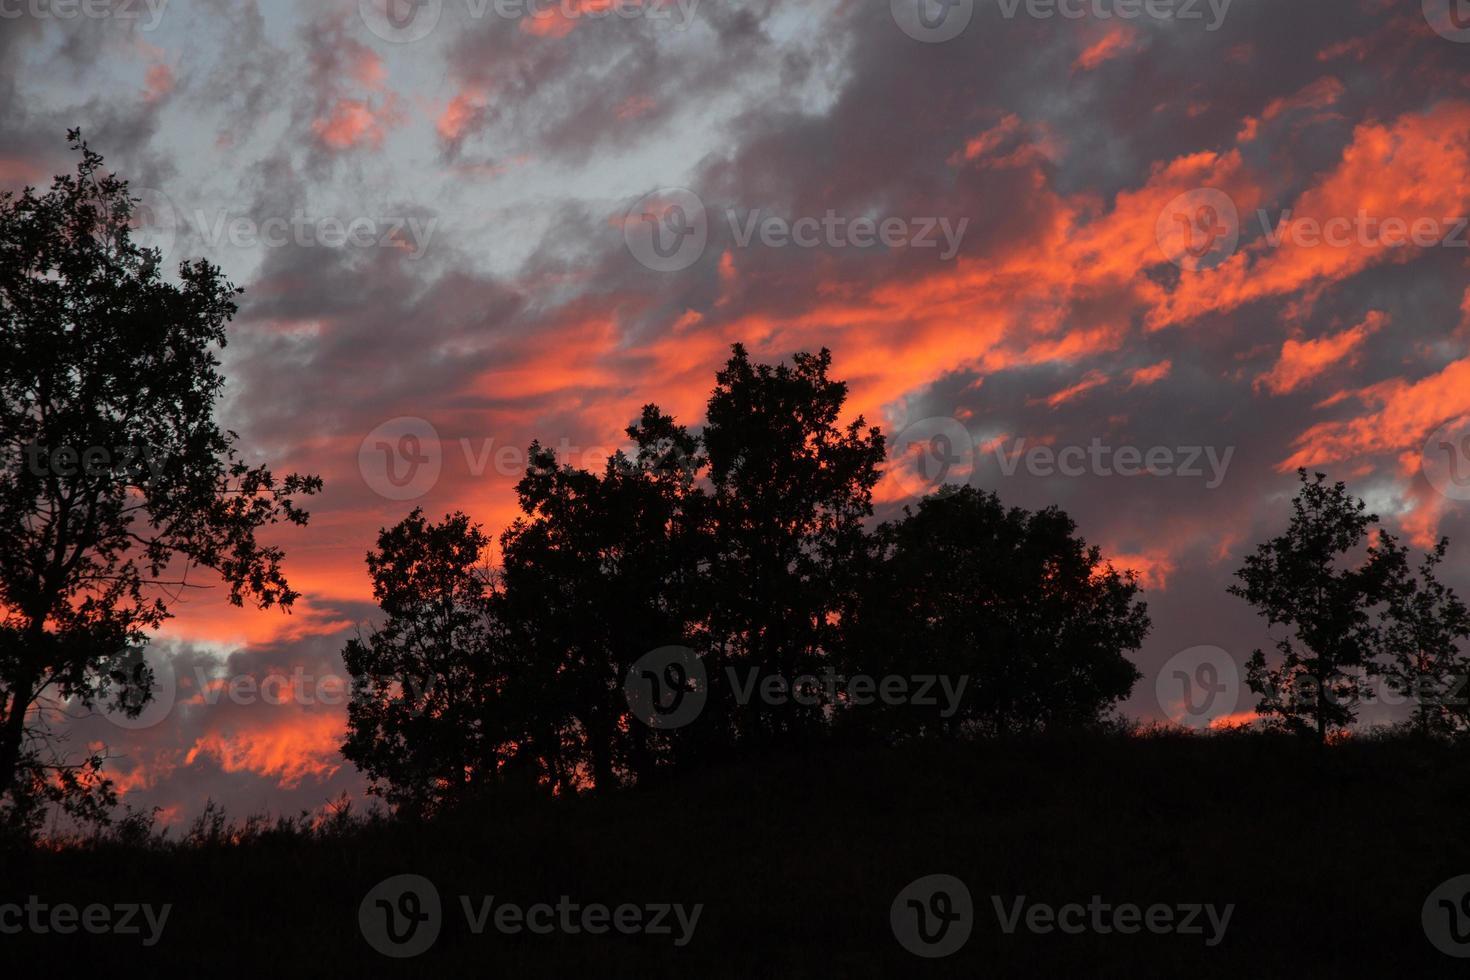 tramonto sul monte delle querce - puesta de sol foto